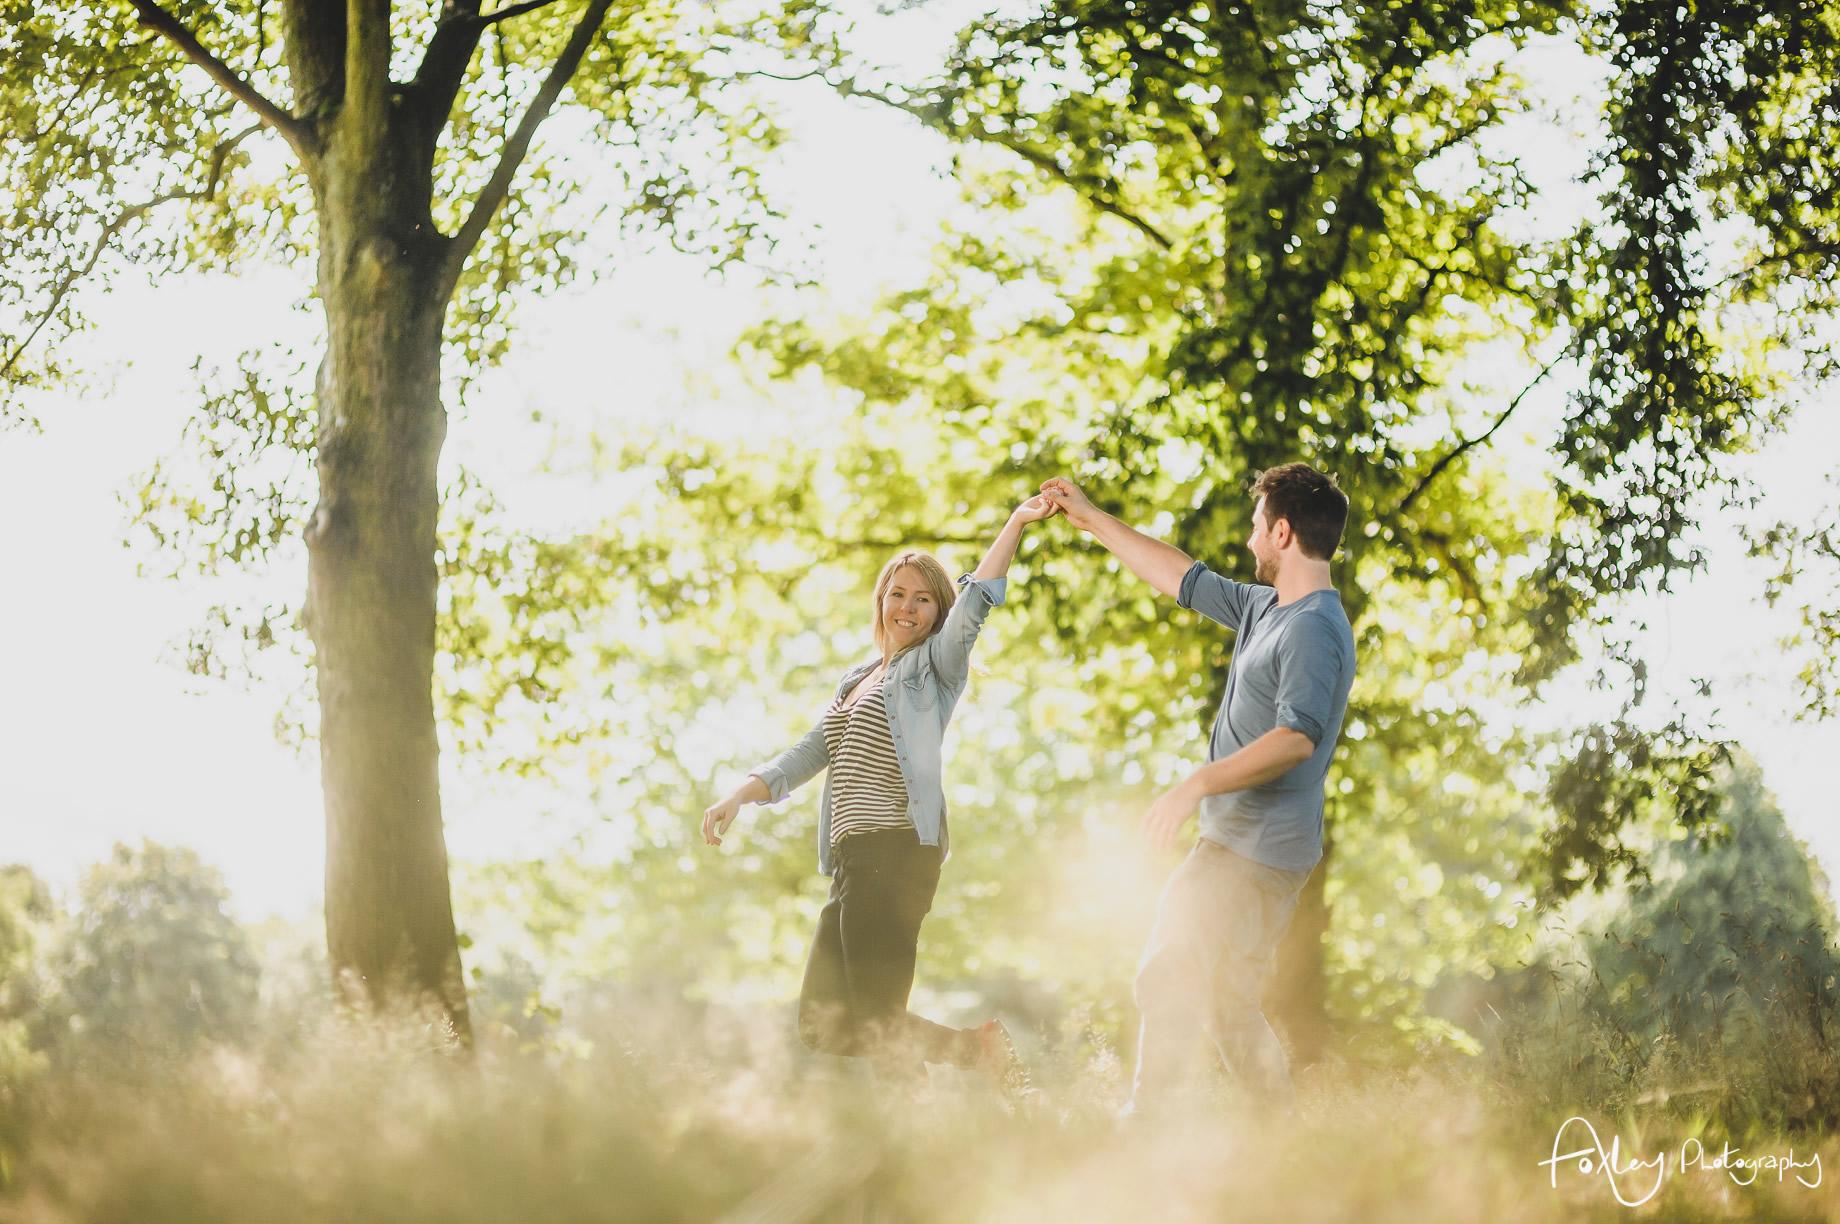 Lyndsey and Jon Pre-Wedding Shoot at Sefton Park 022